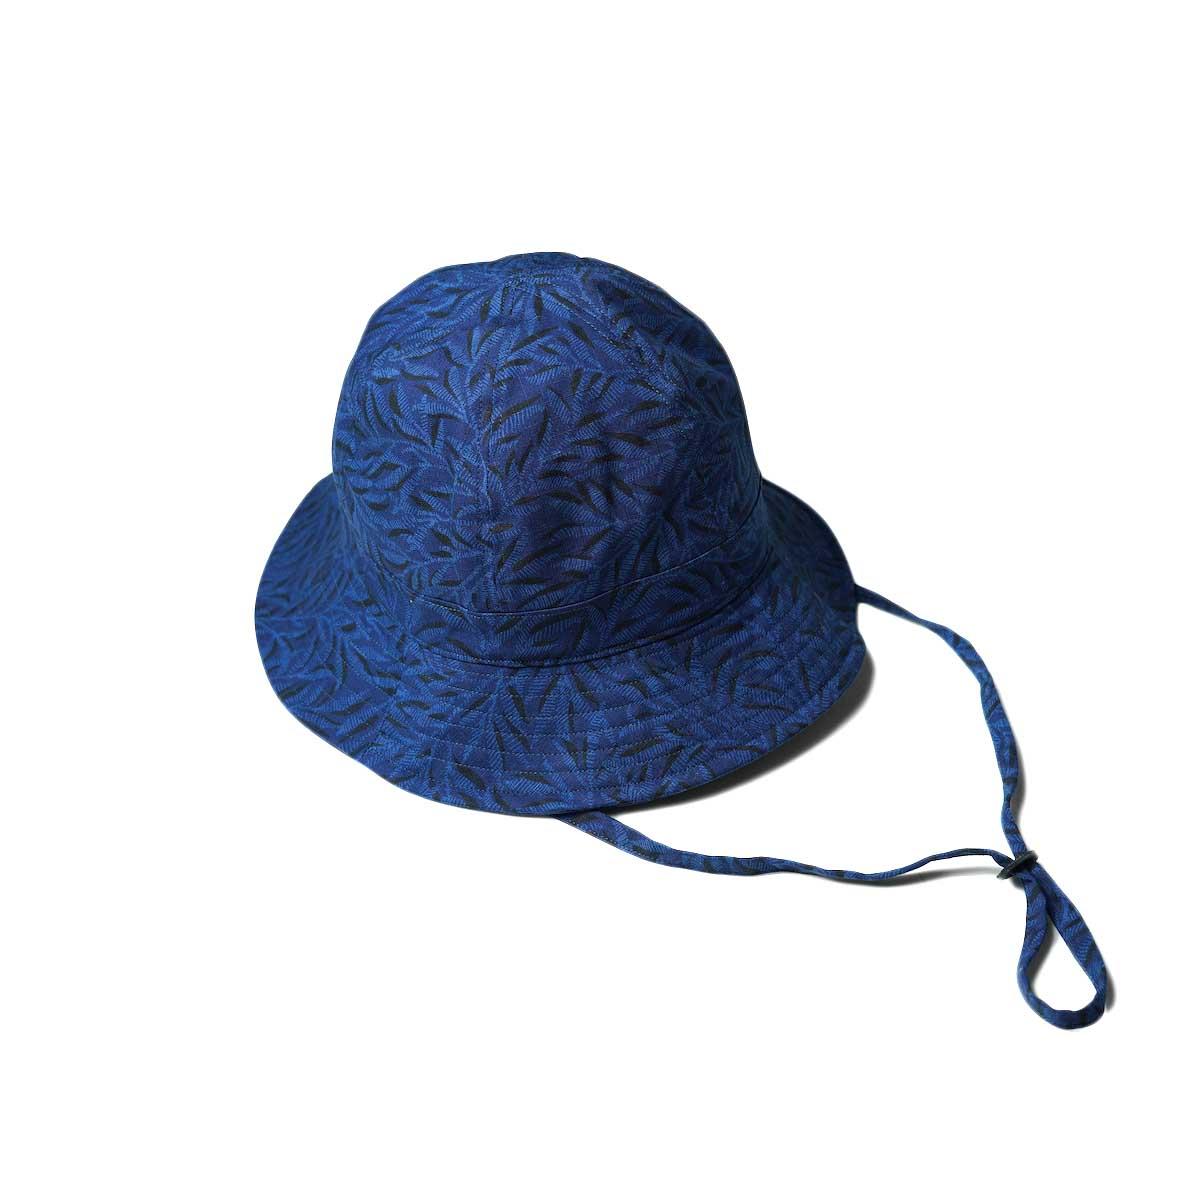 nonnative / PLOUGHMAN HAT COTTON RIPSTOP LIBERTY® PRINT (Navy)